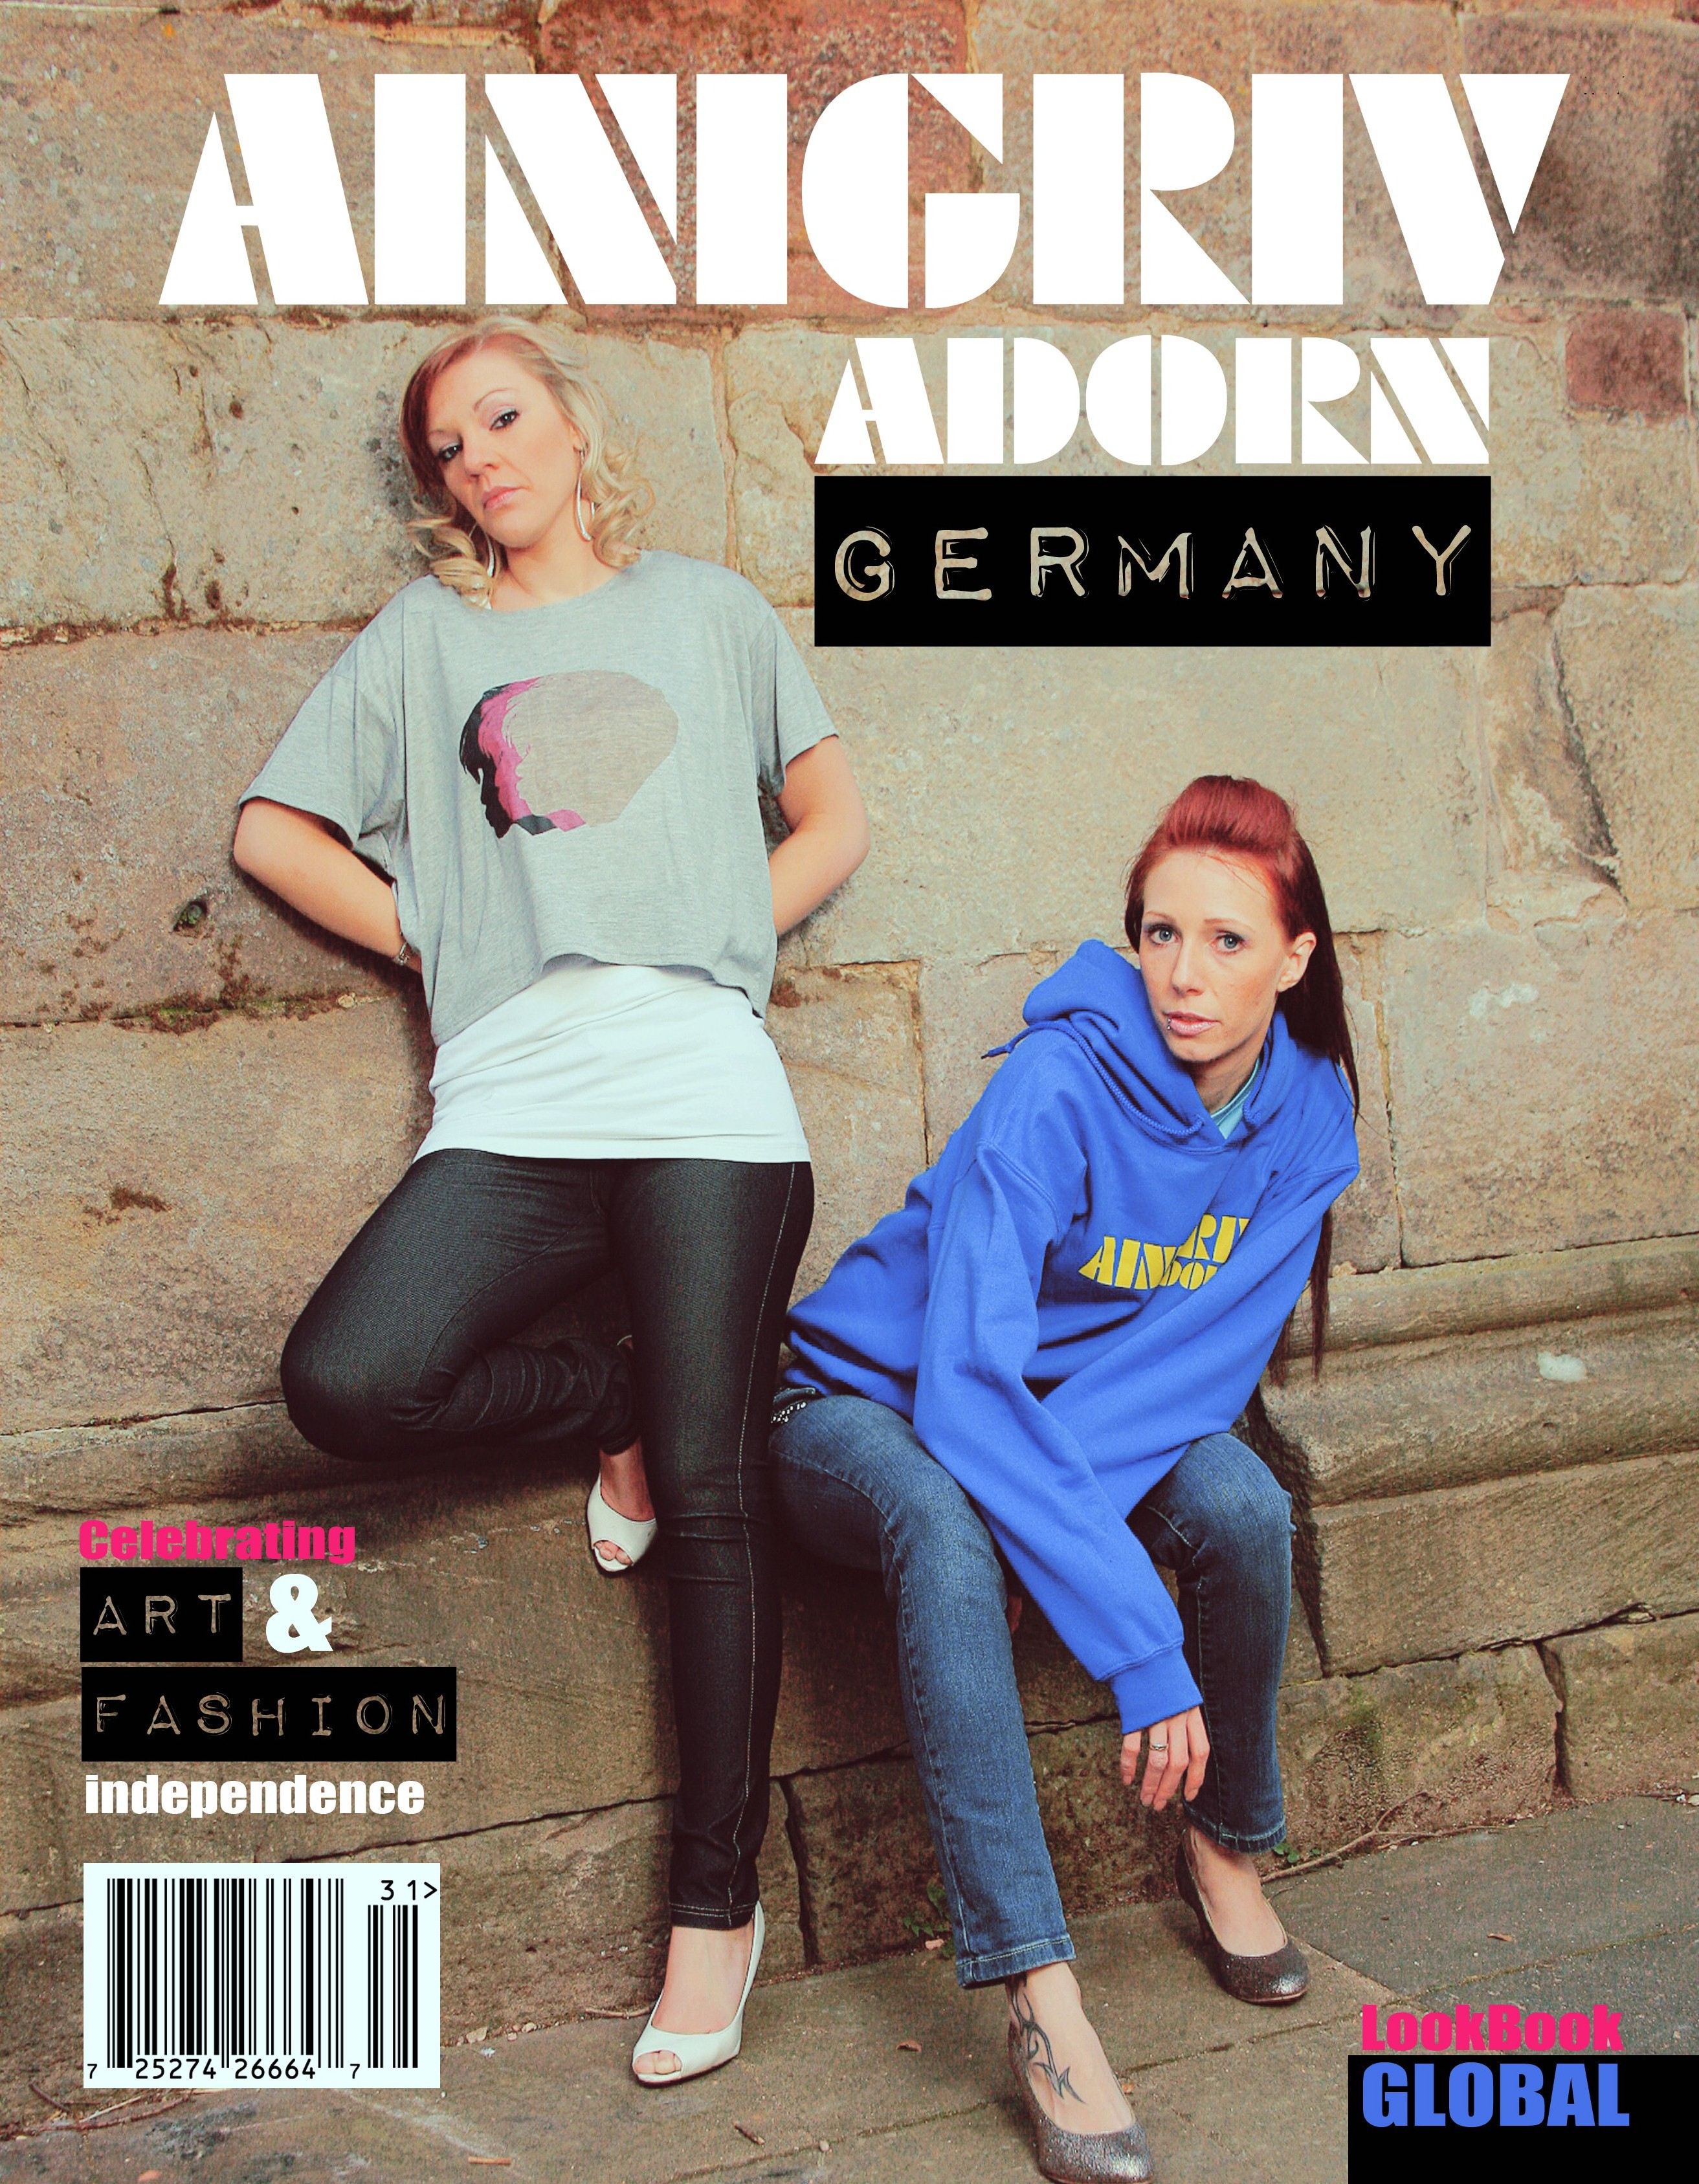 Ainigriv Adorn Look Book 5 Germany